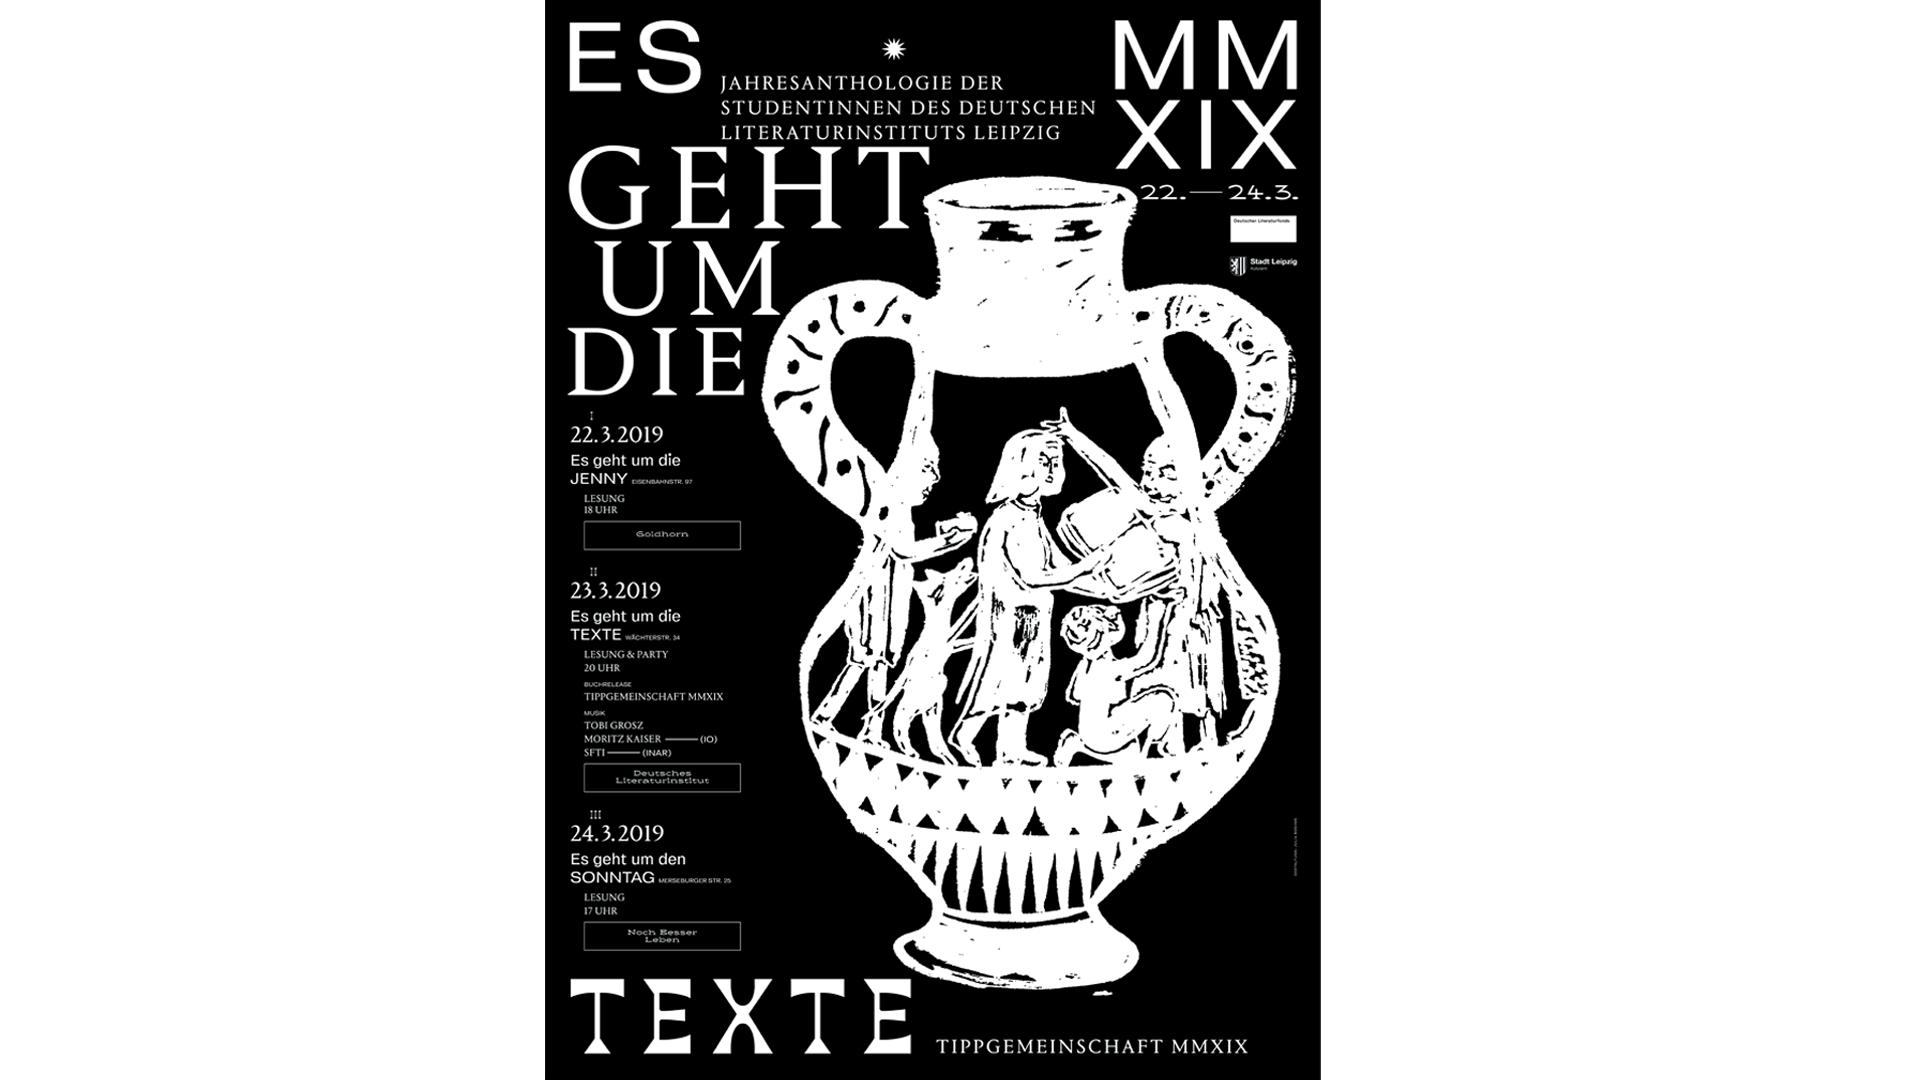 Studio Goof Julia Boehme Poster Design Literaturinstitut Verlangsbuchhandlung Plakat Illustration